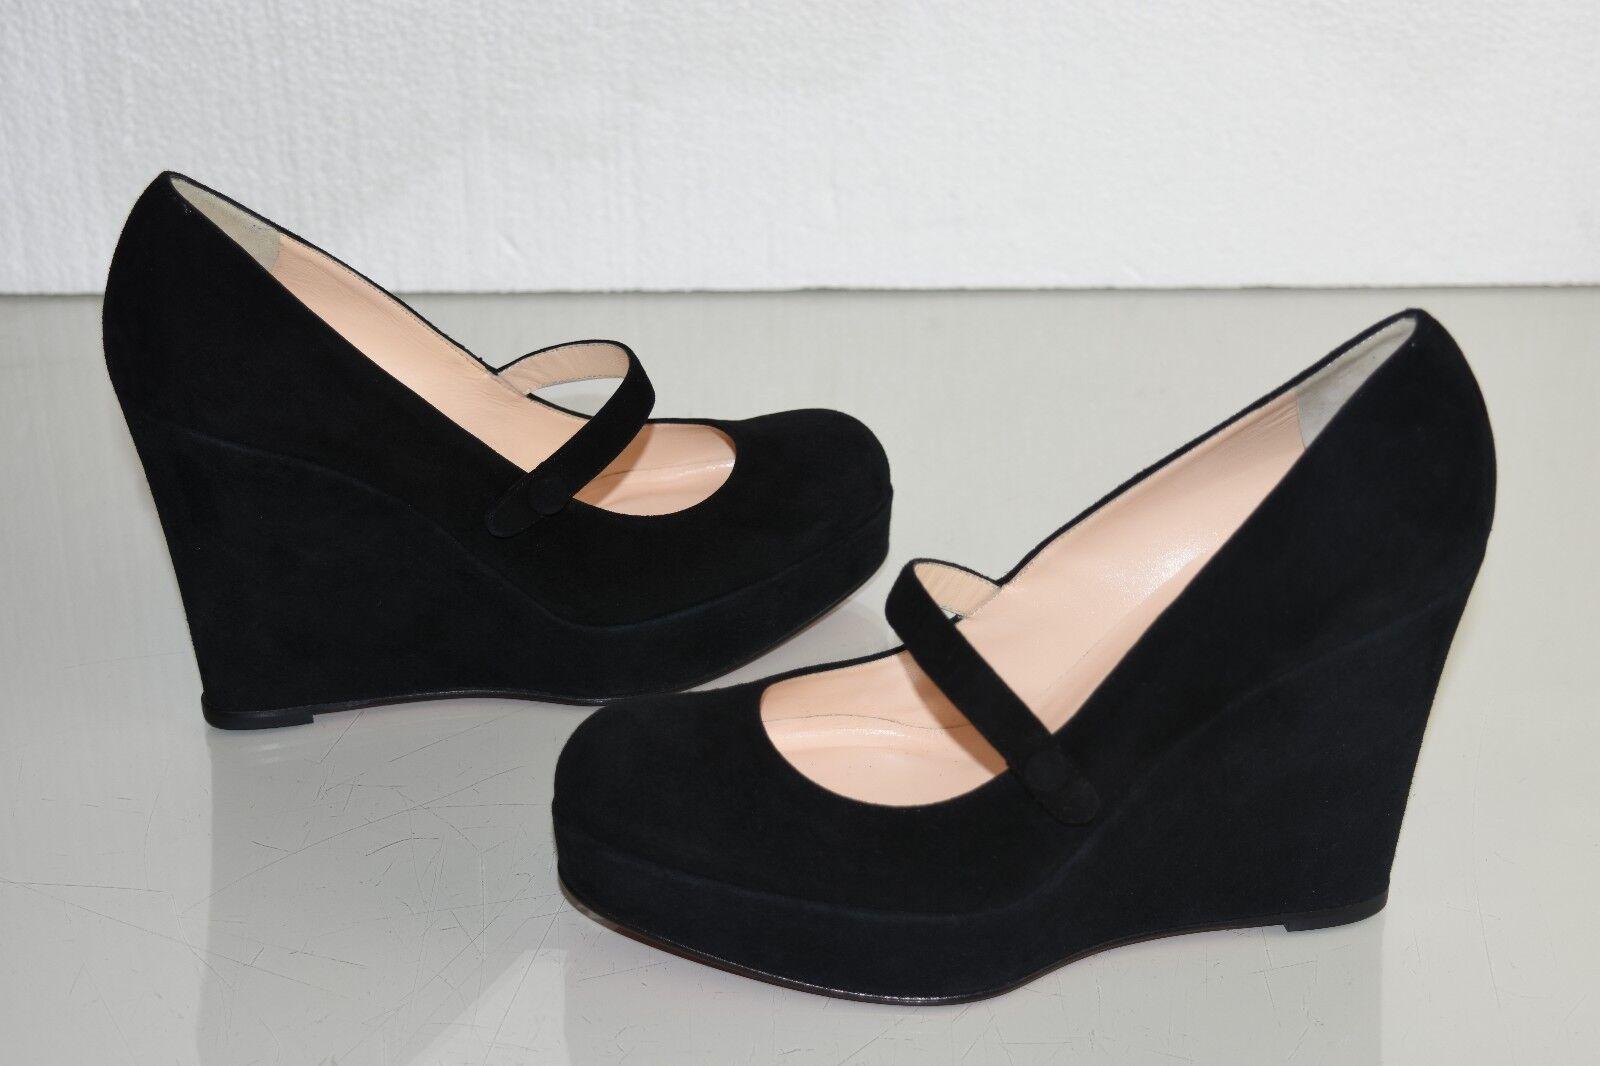 NEW Christian Louboutin WALLYS ZEPPA ZEPPA ZEPPA 110 Wedges Suede Black Platform shoes 40 d2bf3e